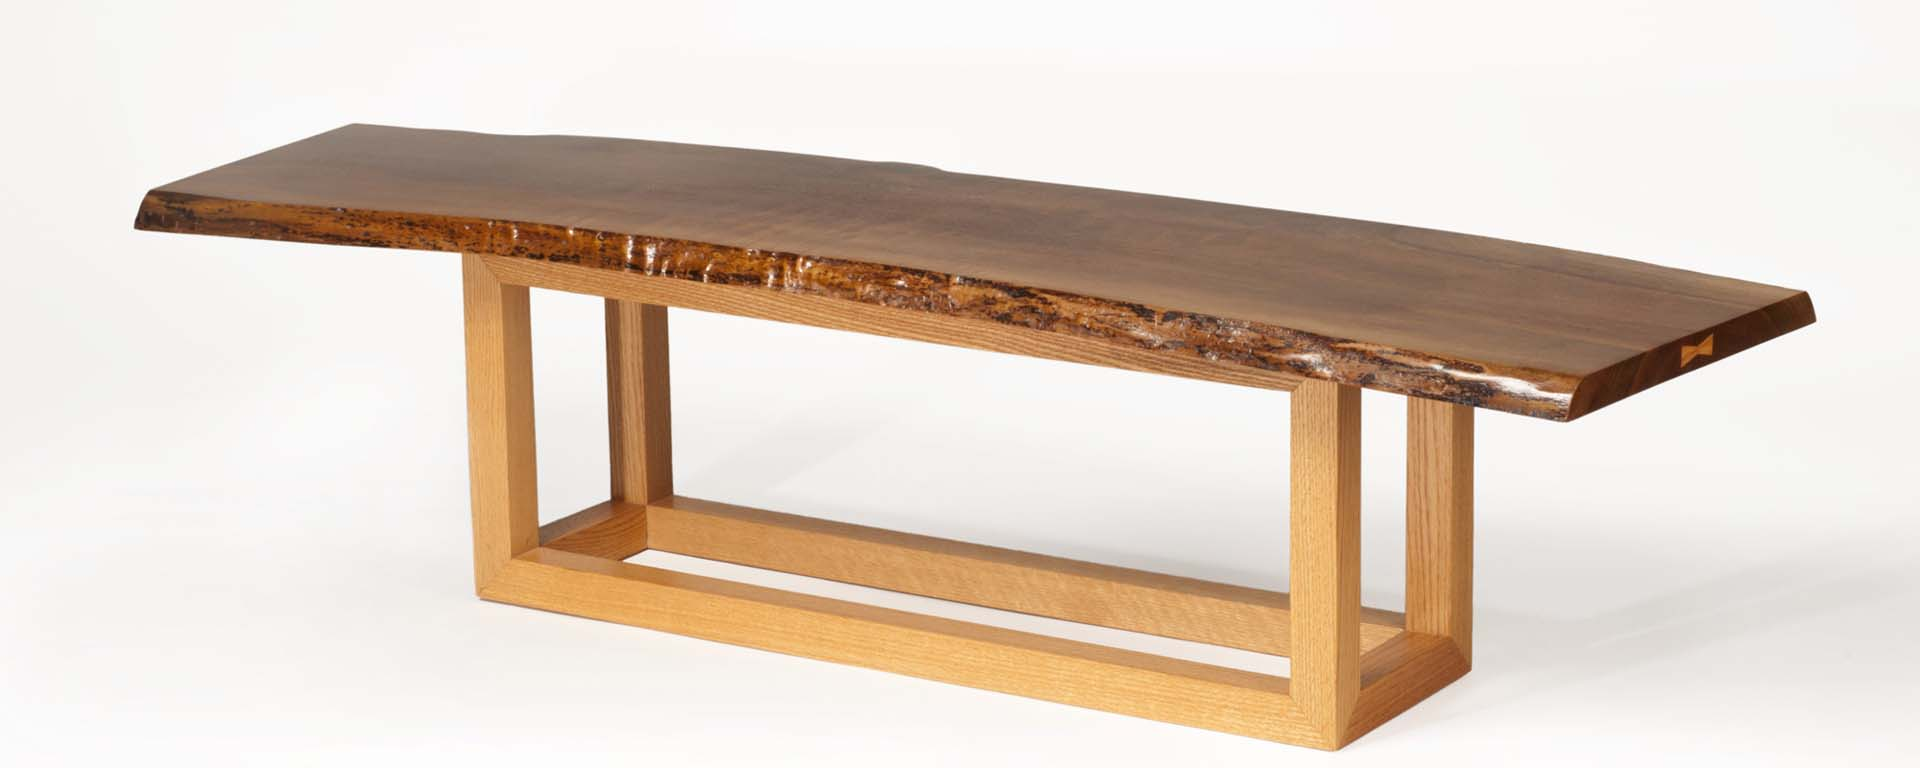 walnut-rustic-contemporary-800